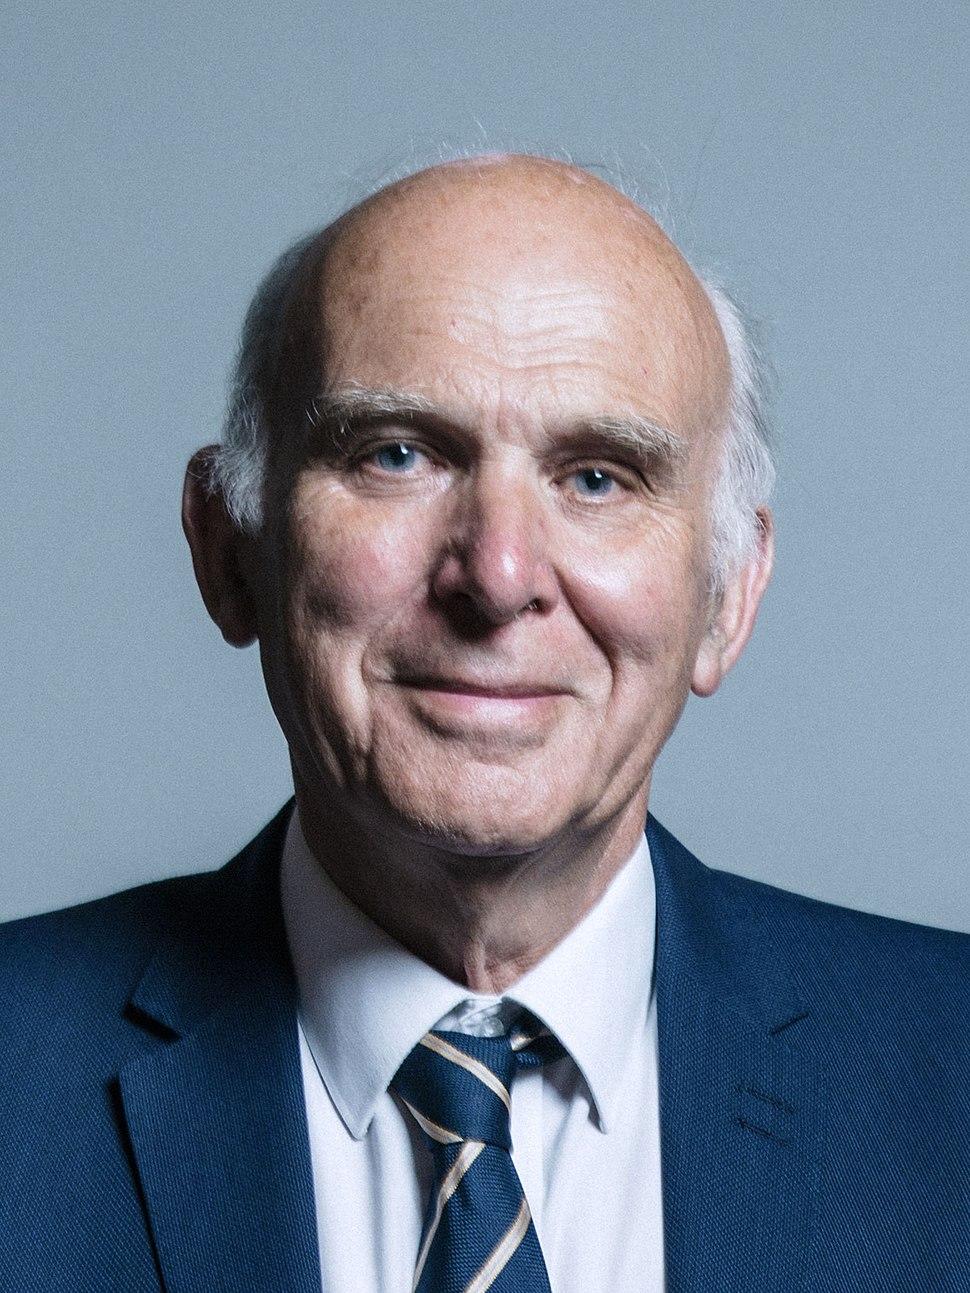 Official portrait of Sir Vince Cable crop 2